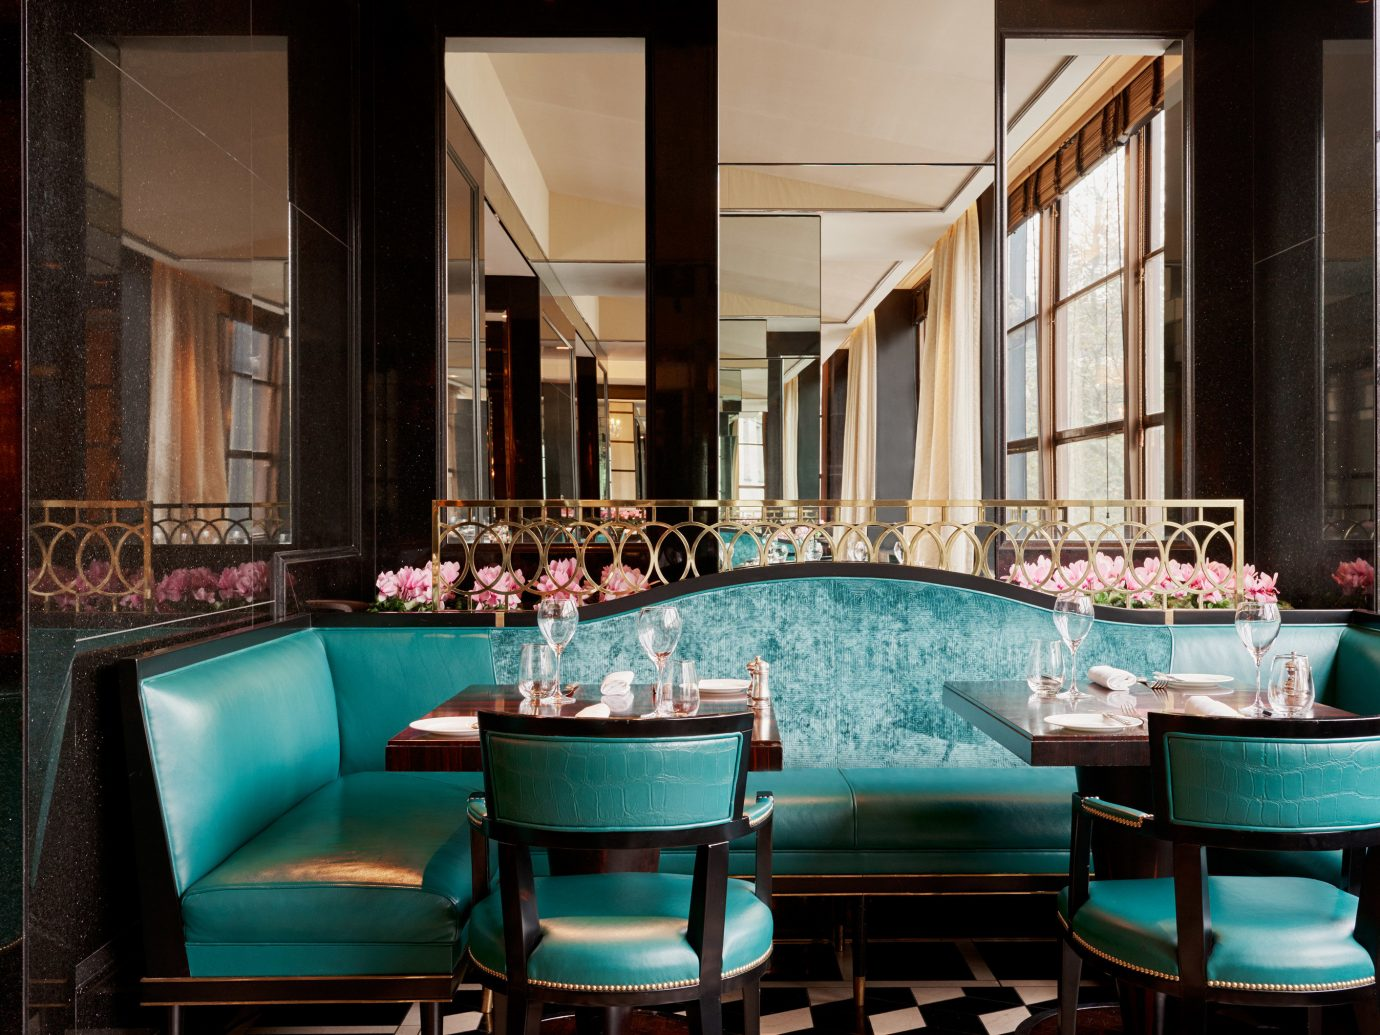 Hotels window chair room restaurant estate interior design Bar meal Design Lobby blue function hall furniture set